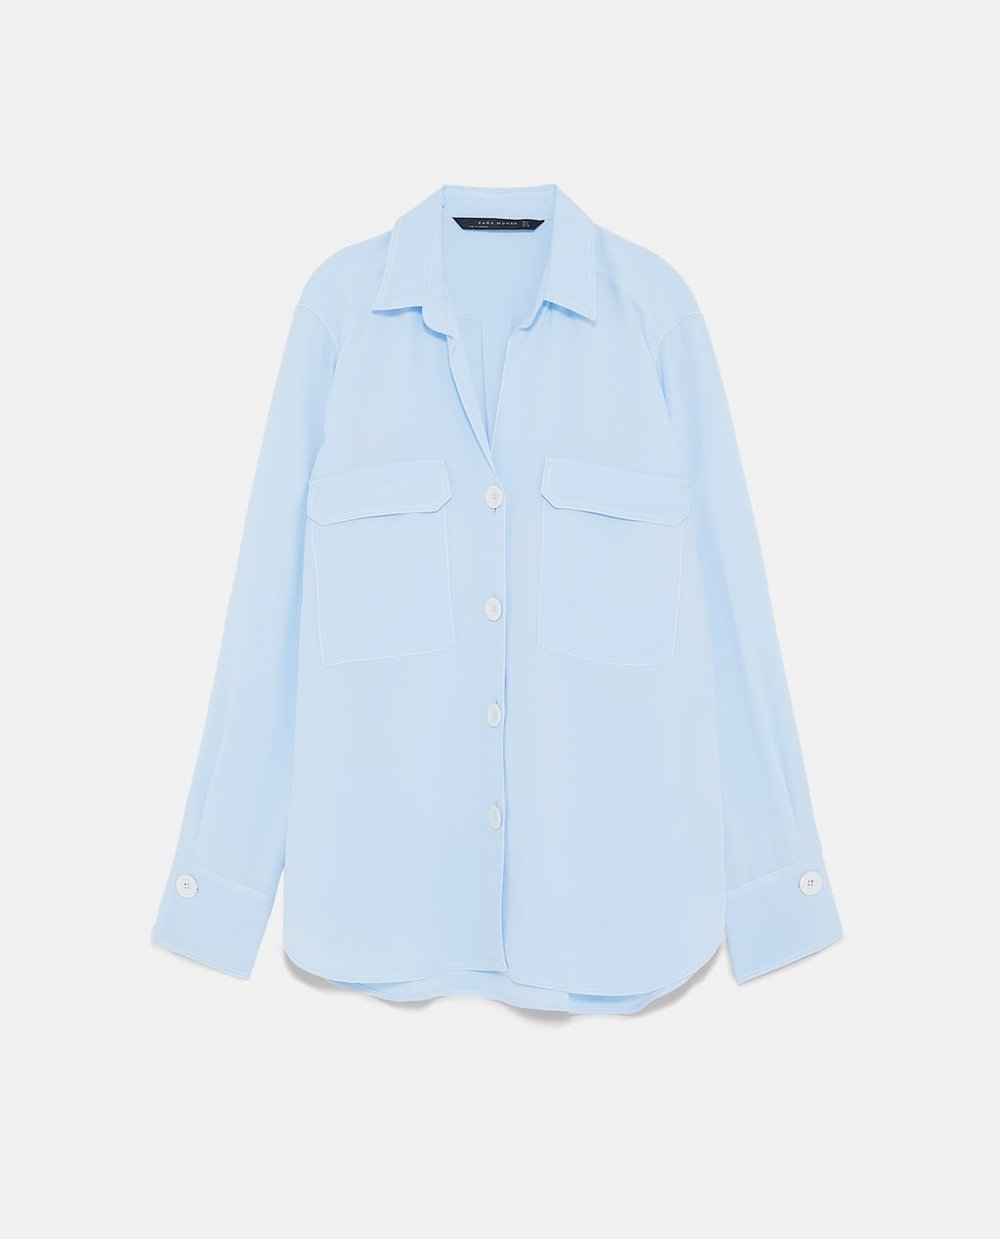 Zara Shirt with Contrasting Topstitching